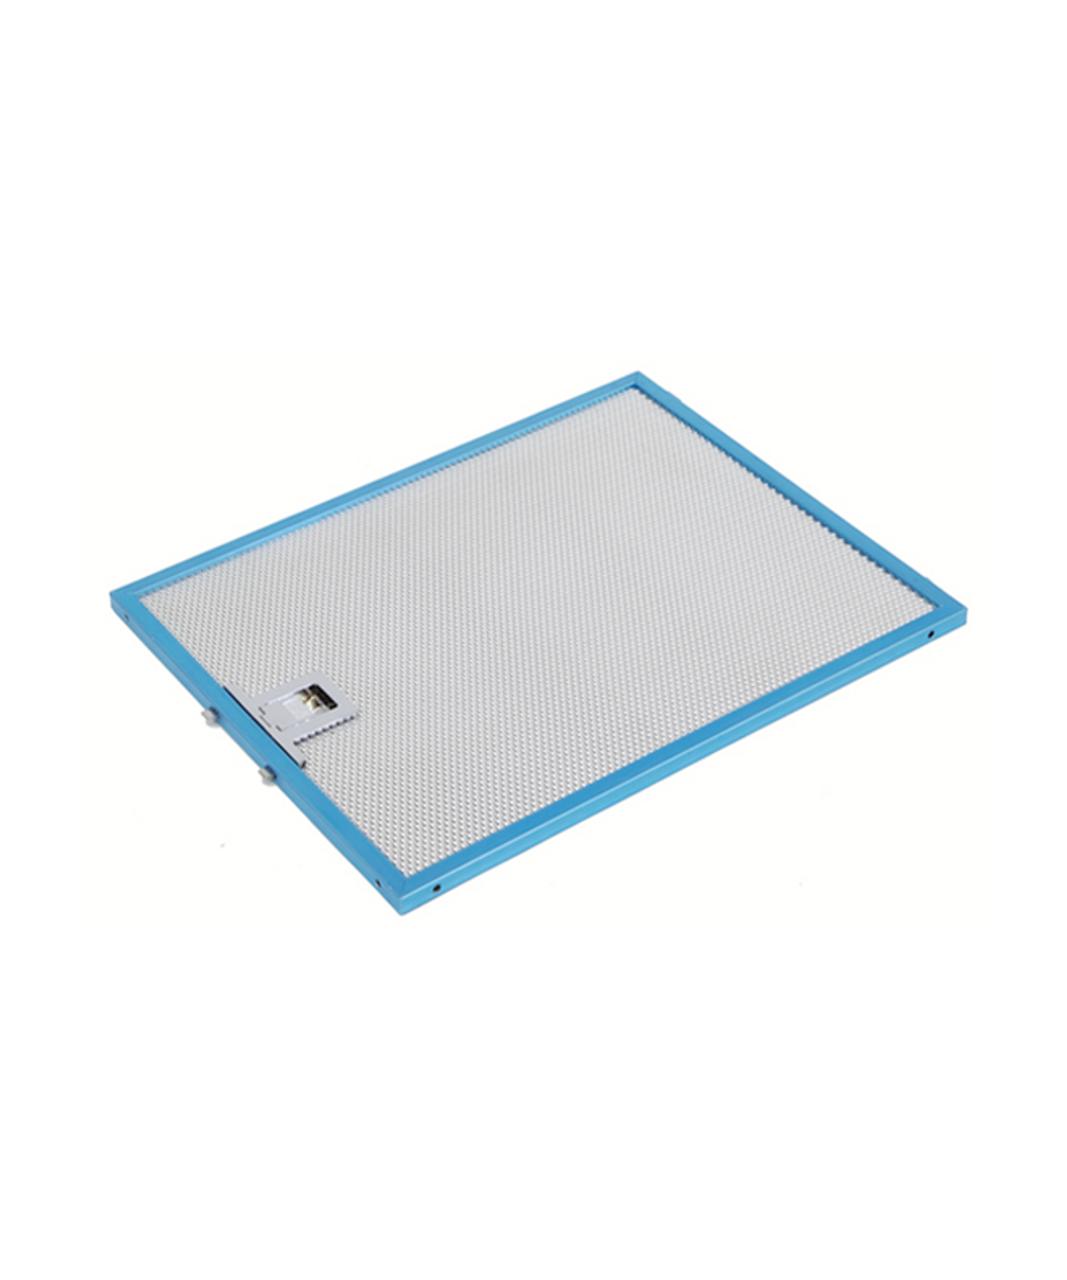 Fisher & Paykel R104660 - Metal Rangehood Filter